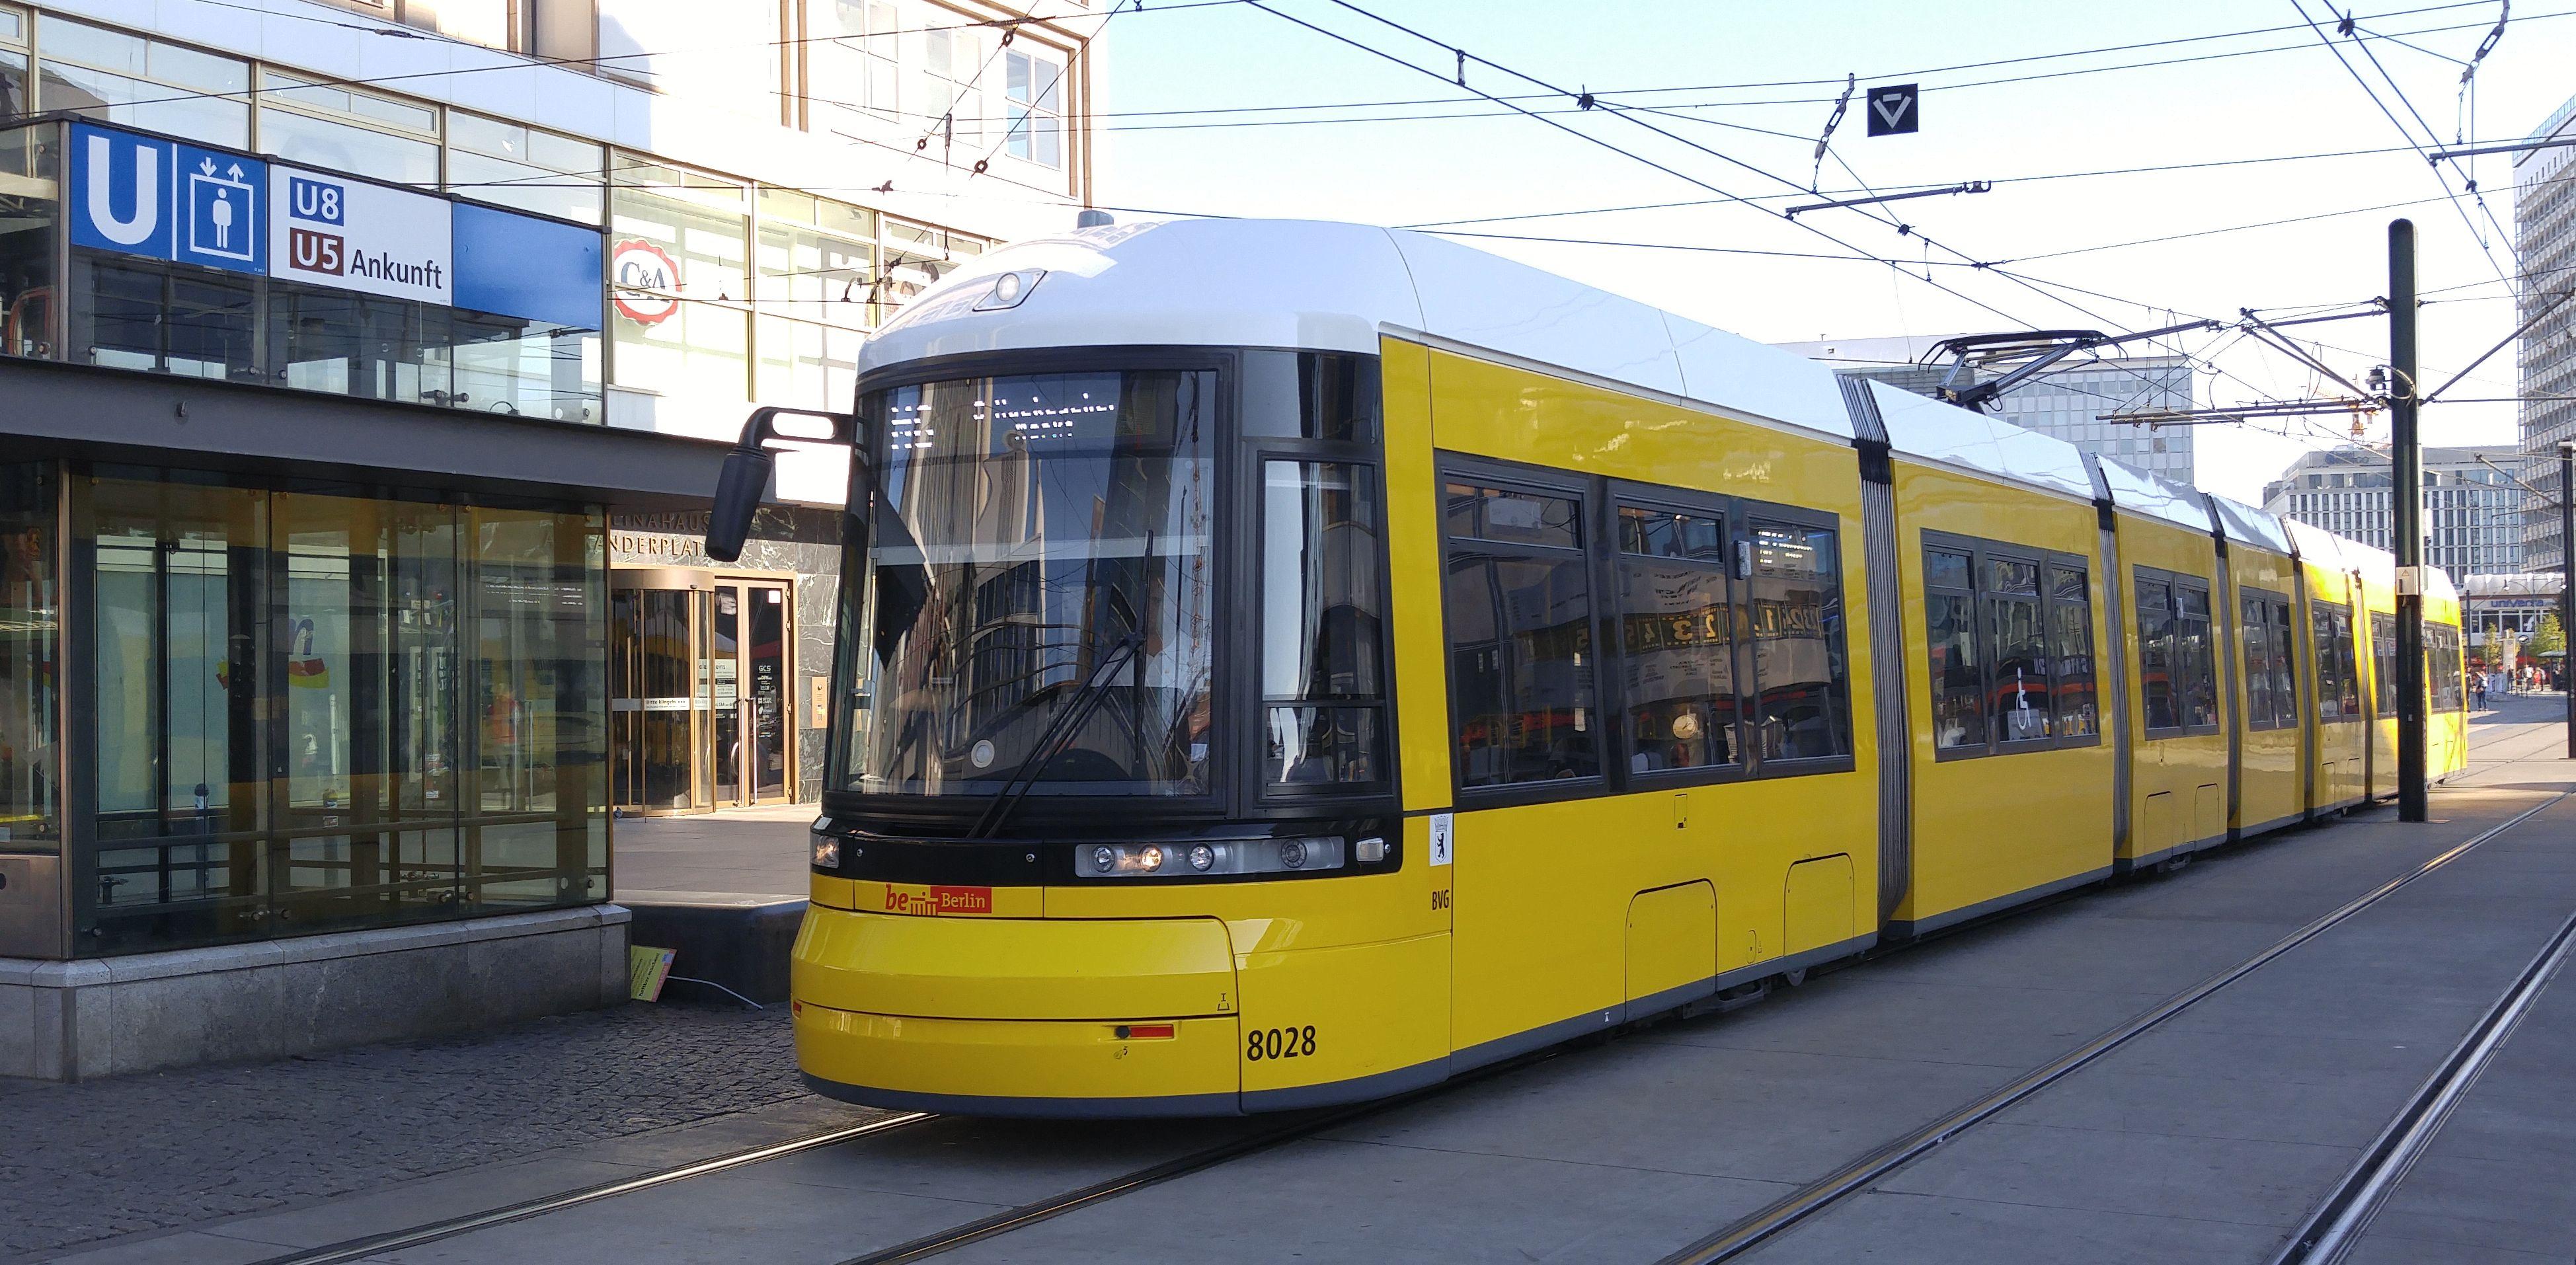 Foto: Straßenbahn 8028, Typ Flexity ERL, Alexanderplatz, 2016